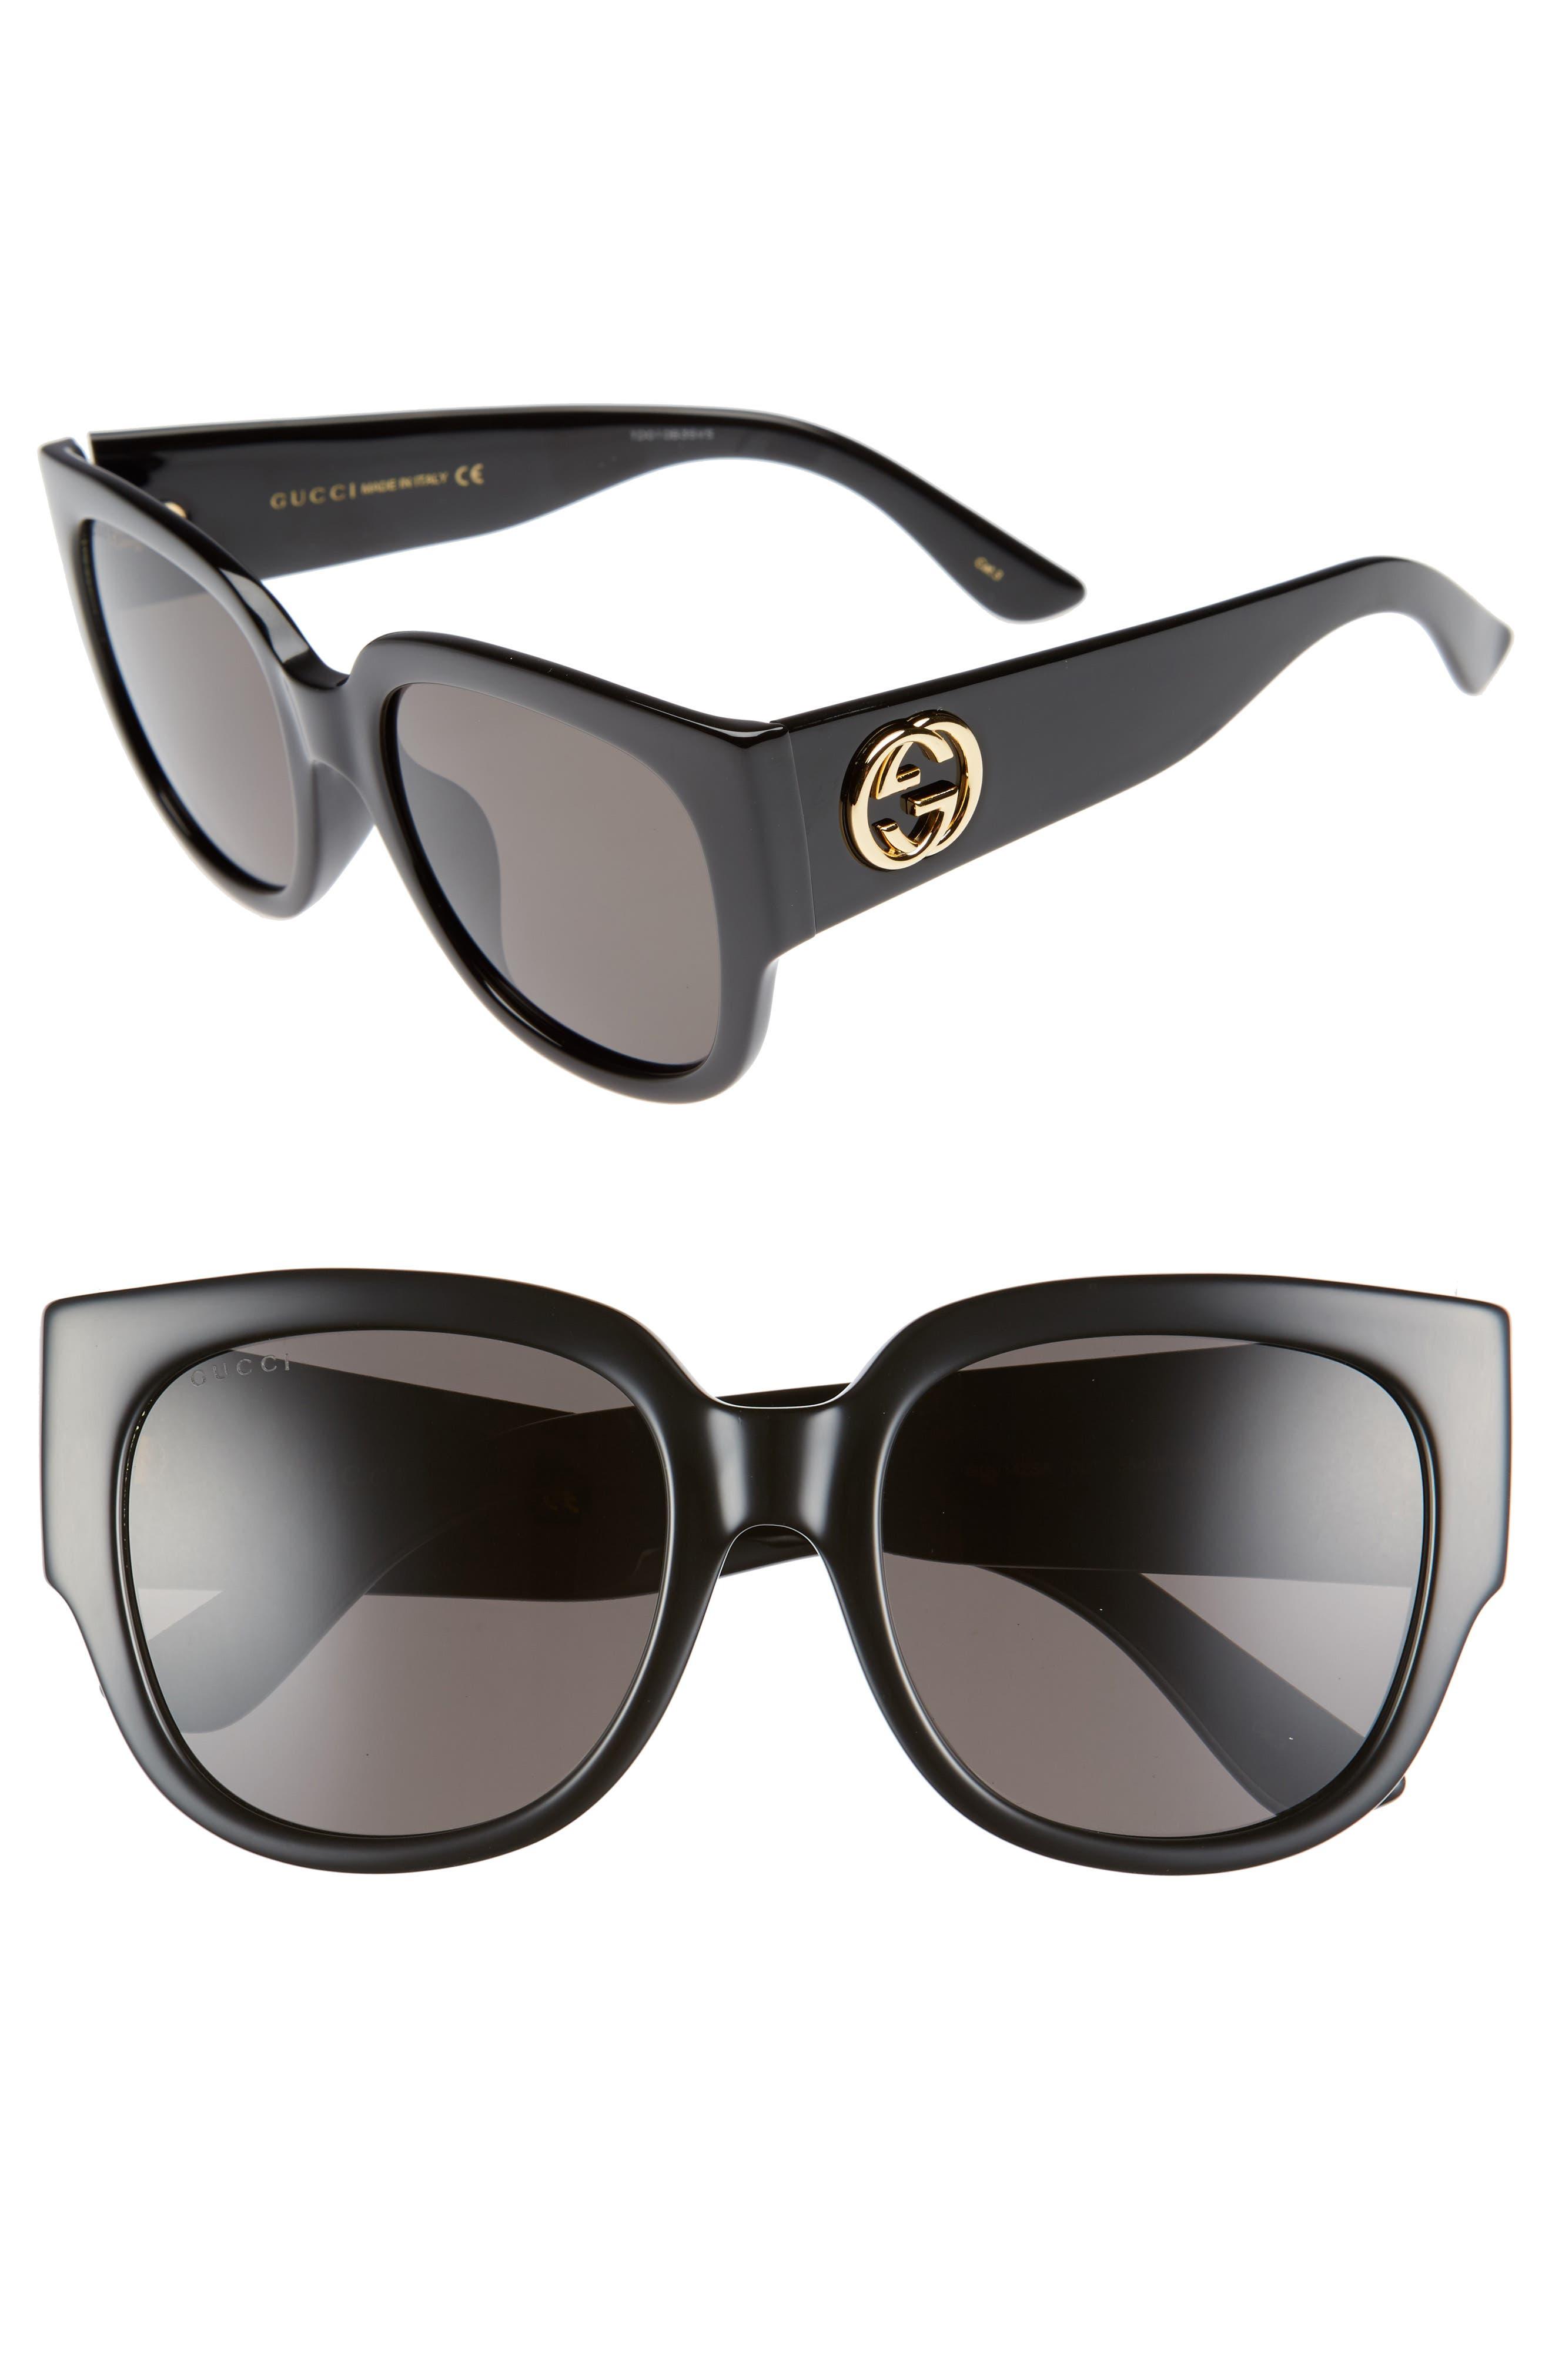 55mm Square Cat Eye Sunglasses,                         Main,                         color, Black/ Grey